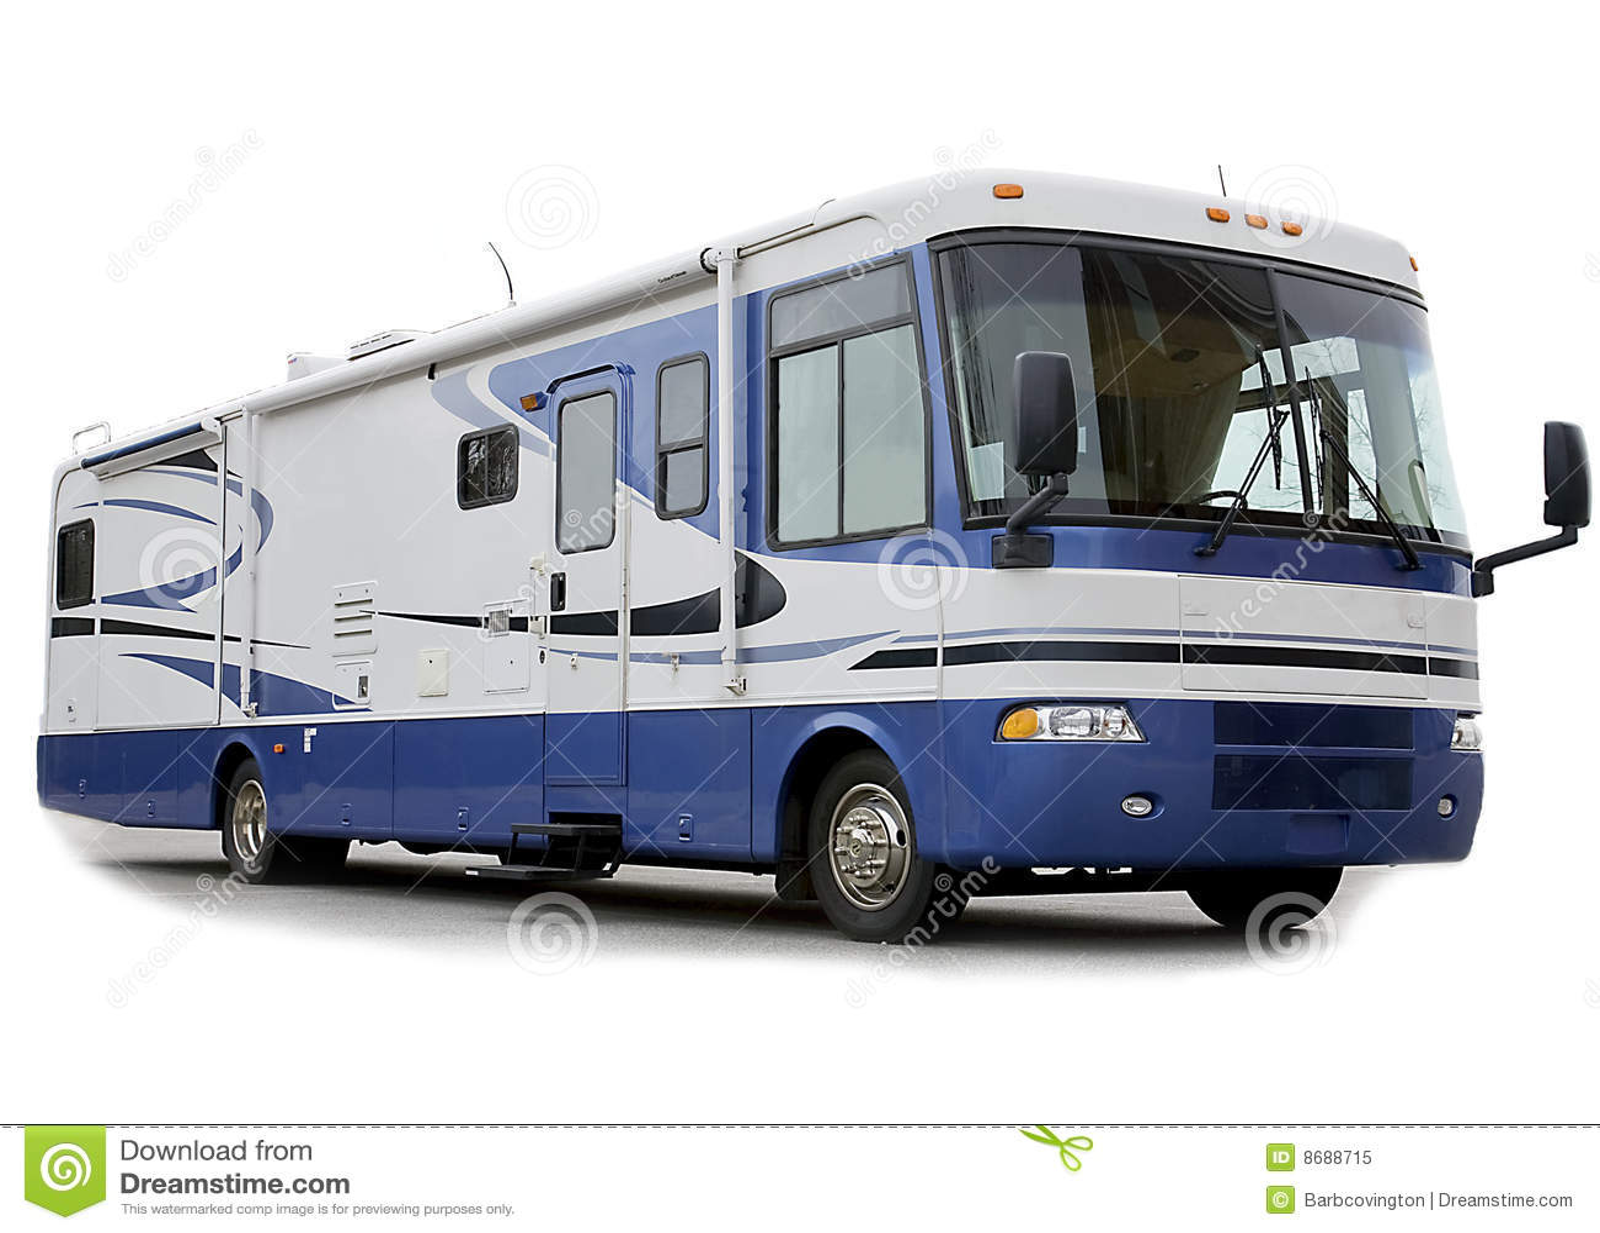 Motor Home RV Royalty Free Stock Photo Image 8688715